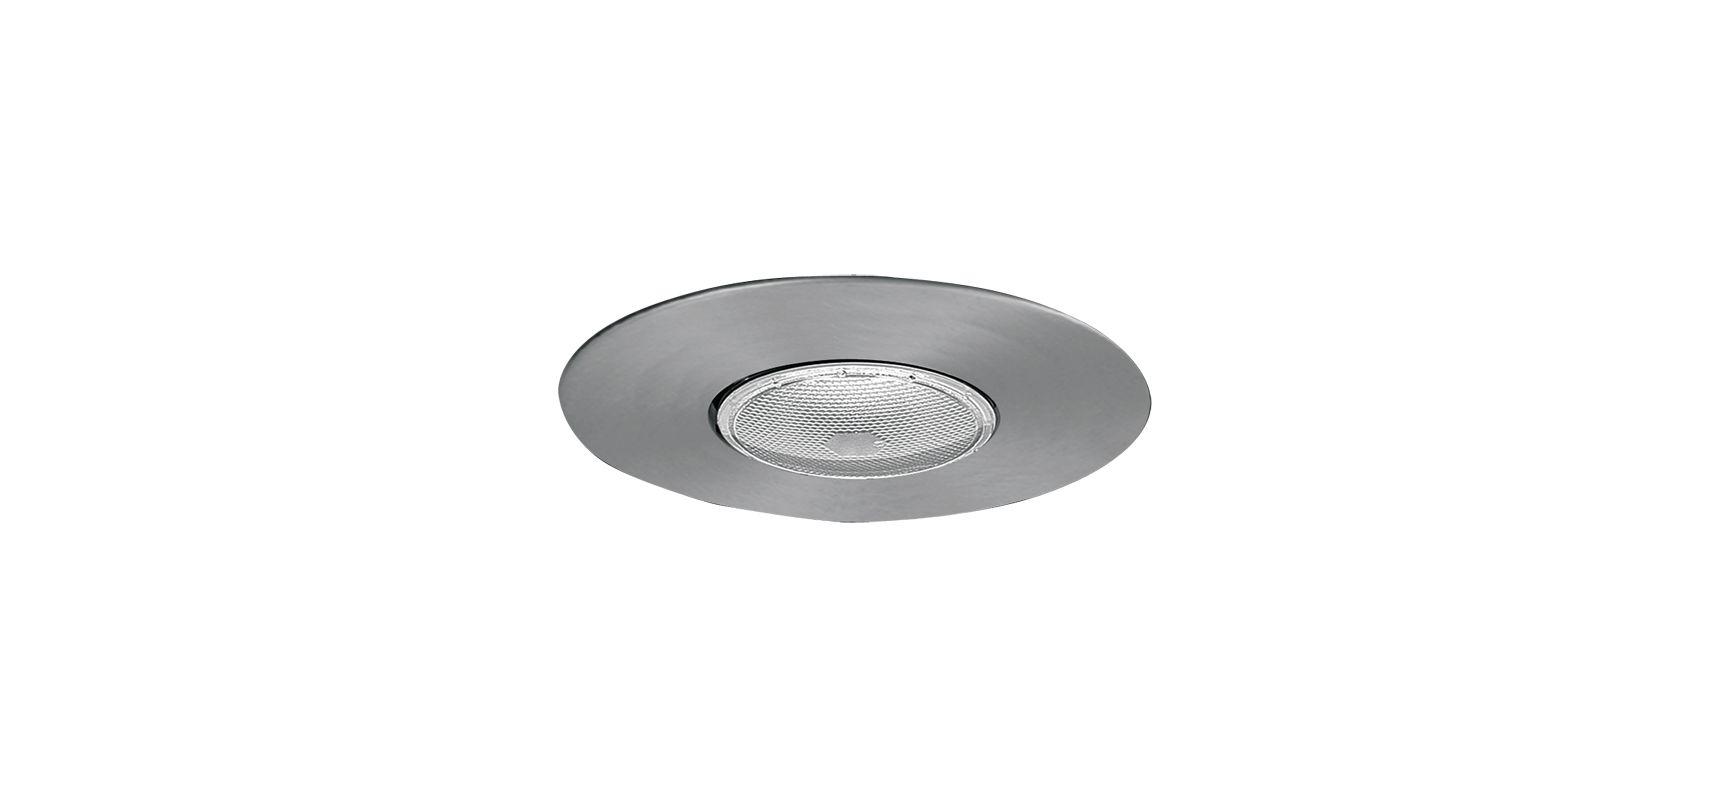 "Elco EL30 6"" Open Trim for 75W Bulbs Nickel Recessed Lights Shower"